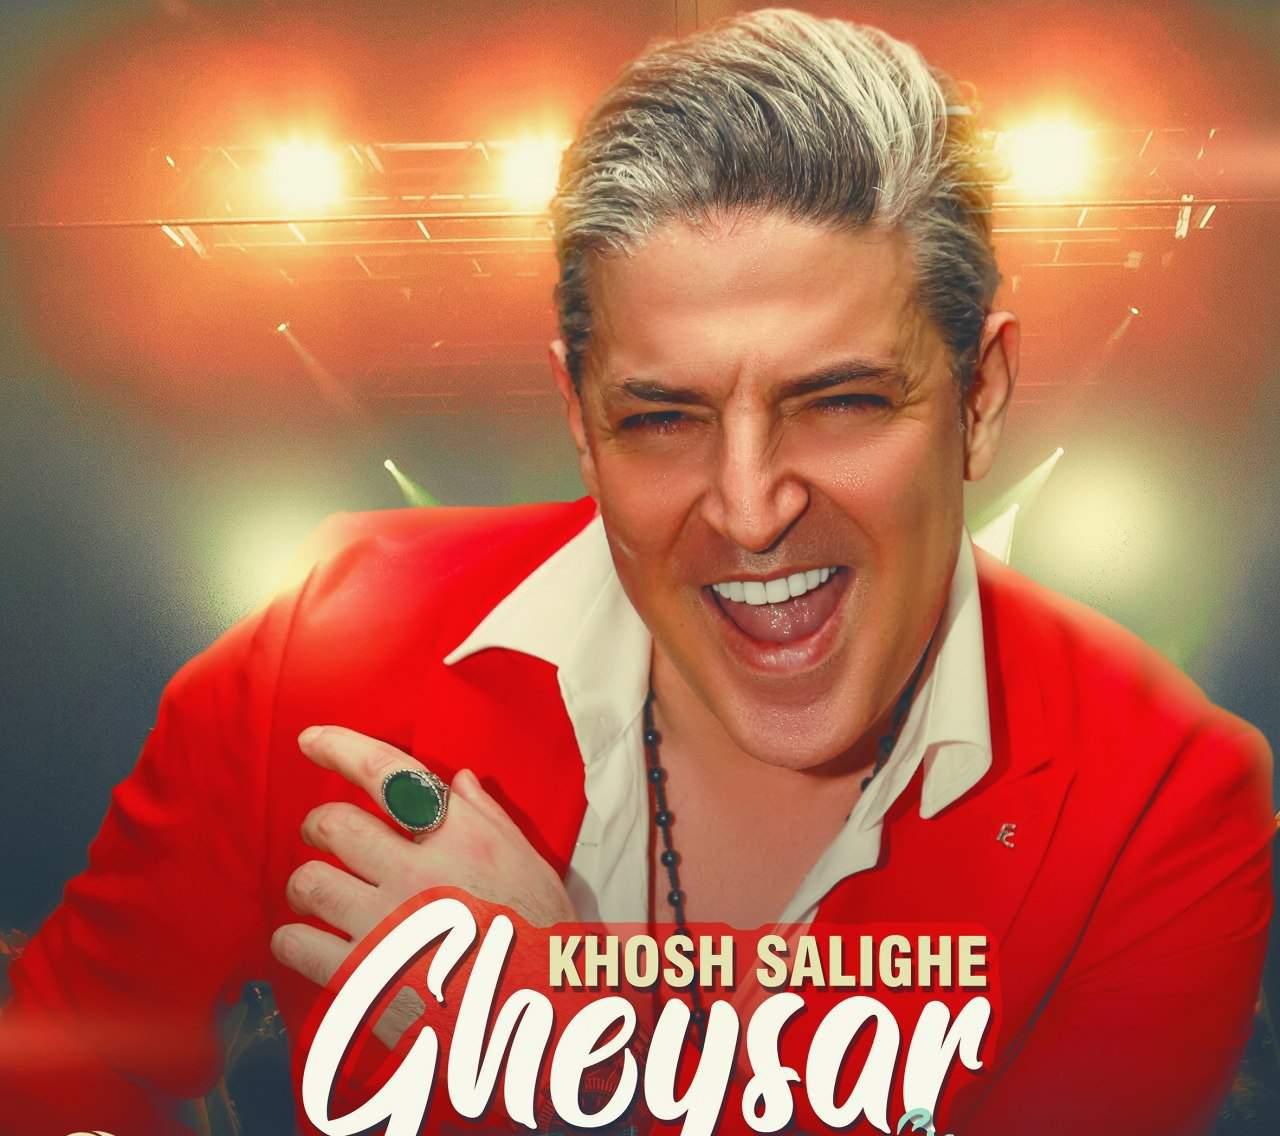 Khosh Salighe